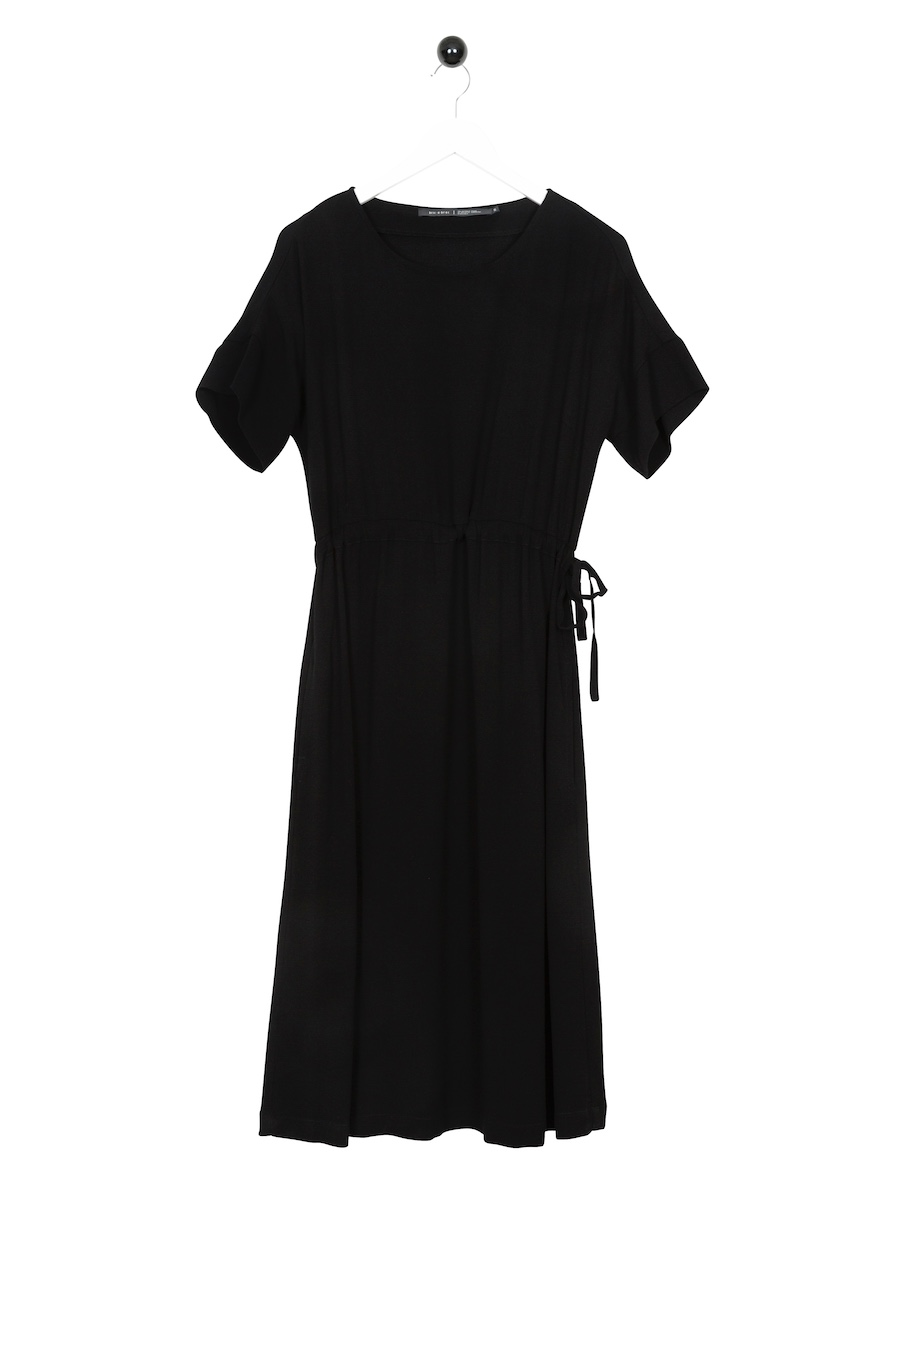 Ebenholts Dress